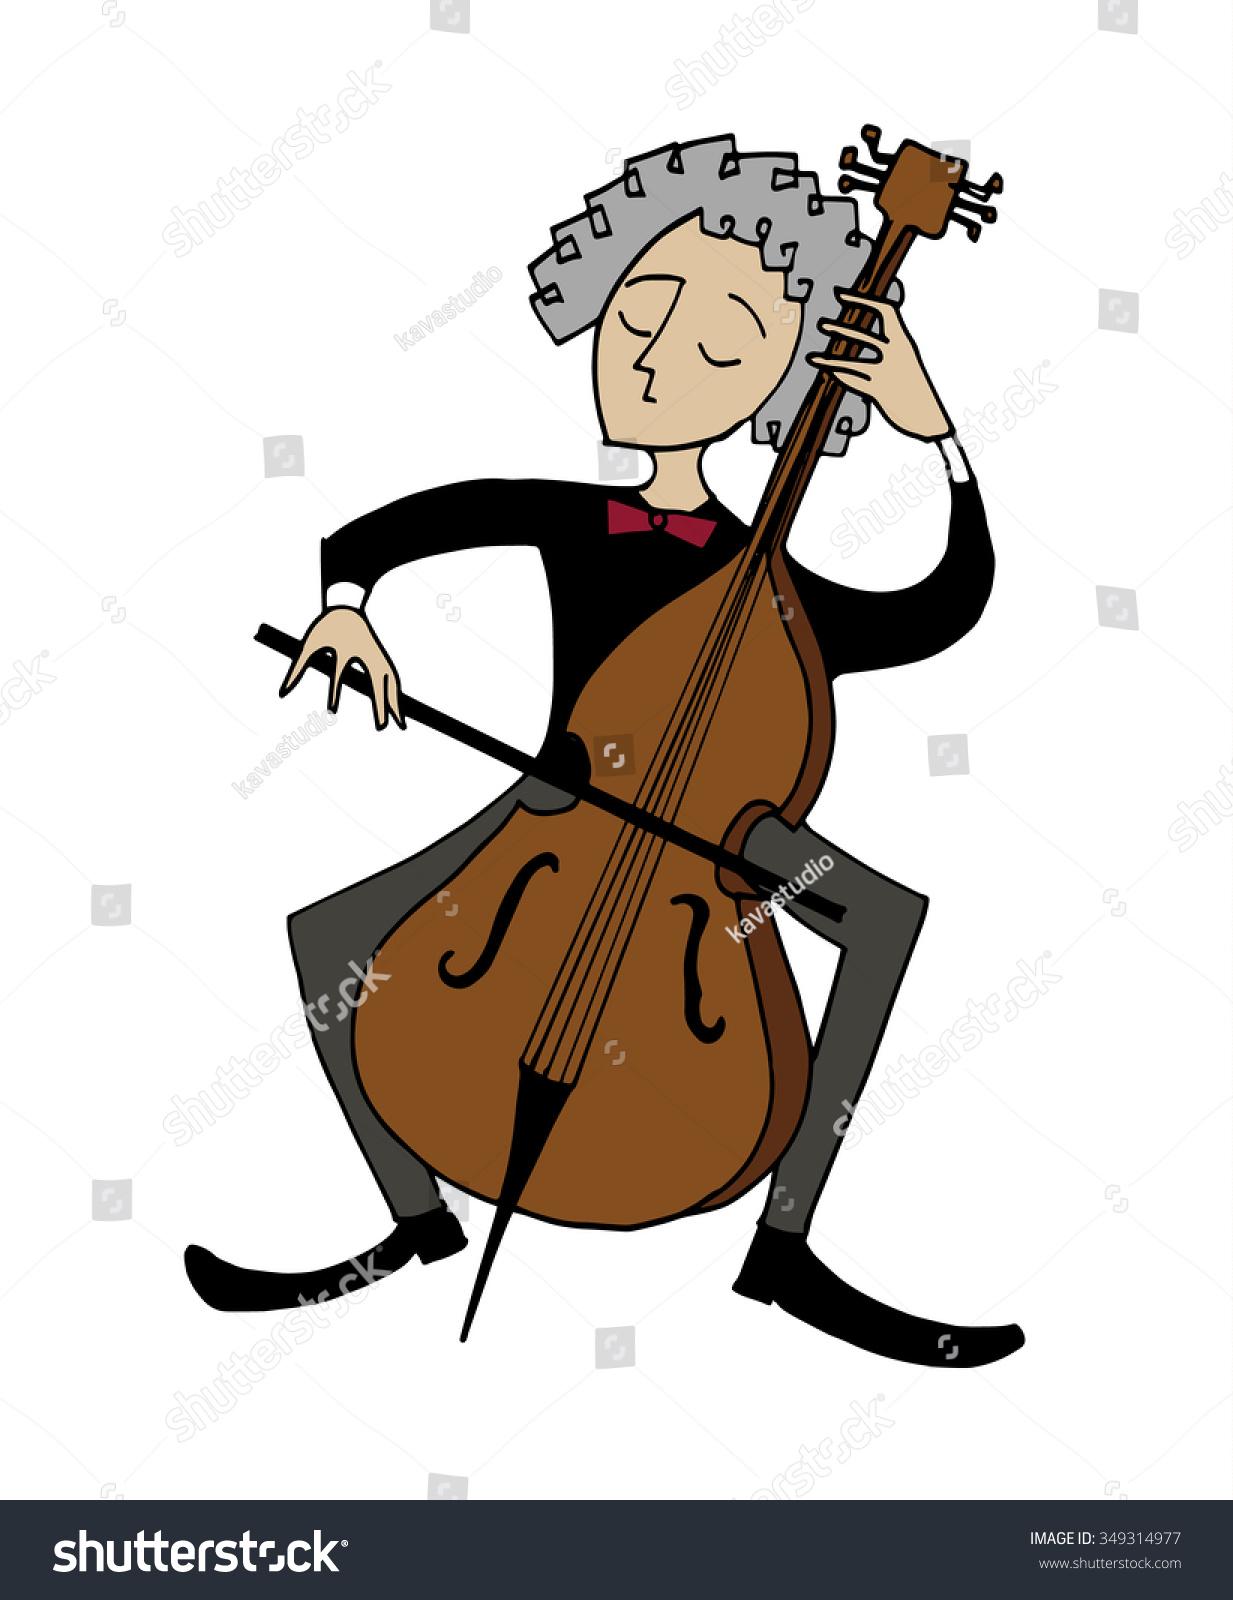 Cartoon cellist musician playing cello clipart stock for Illustration minimaliste